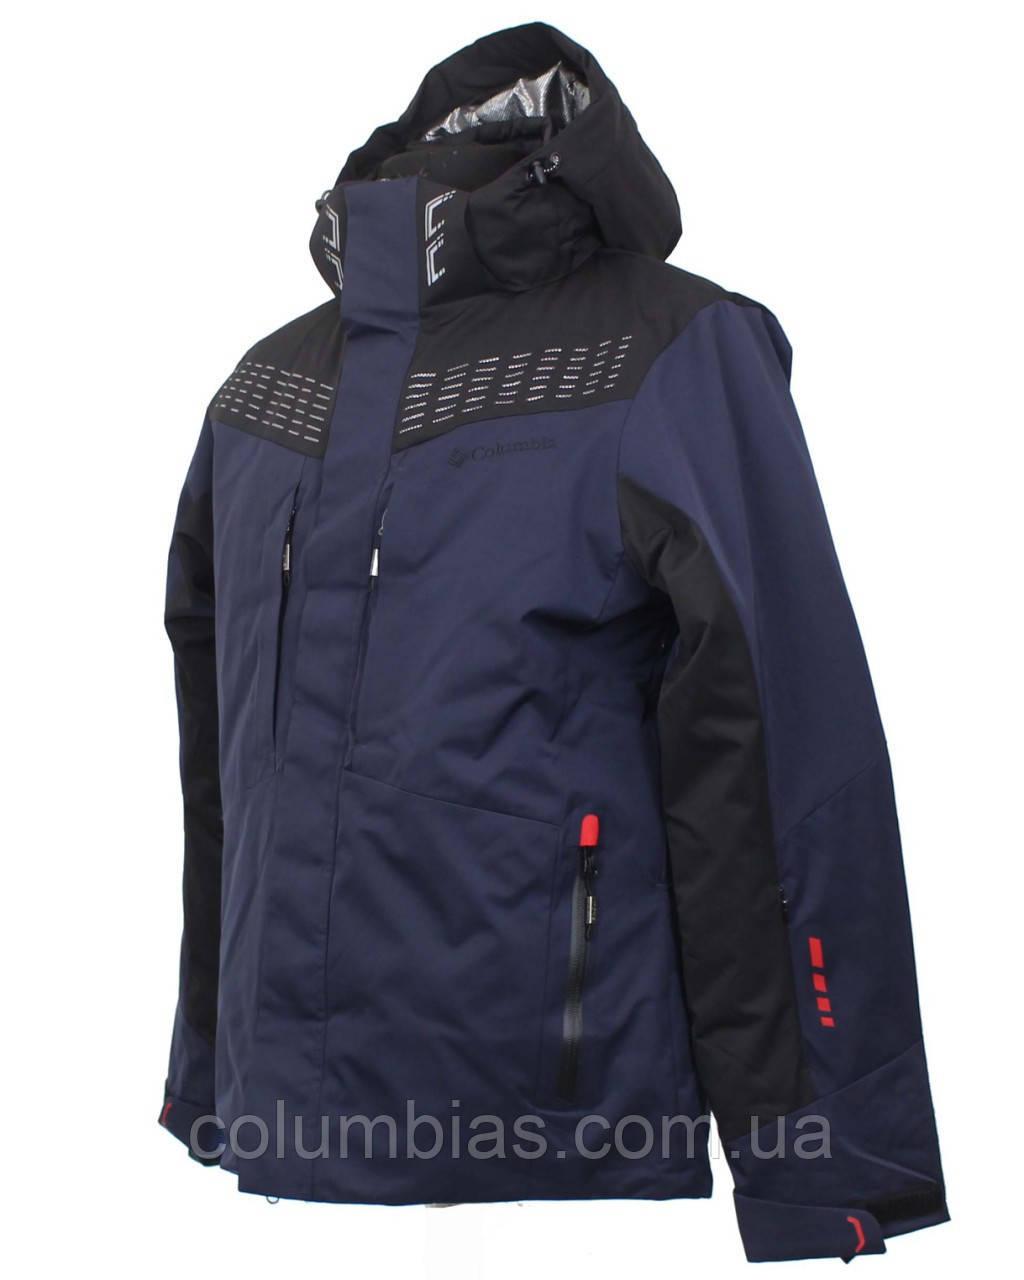 Акция! Лыжная куртка Columbia